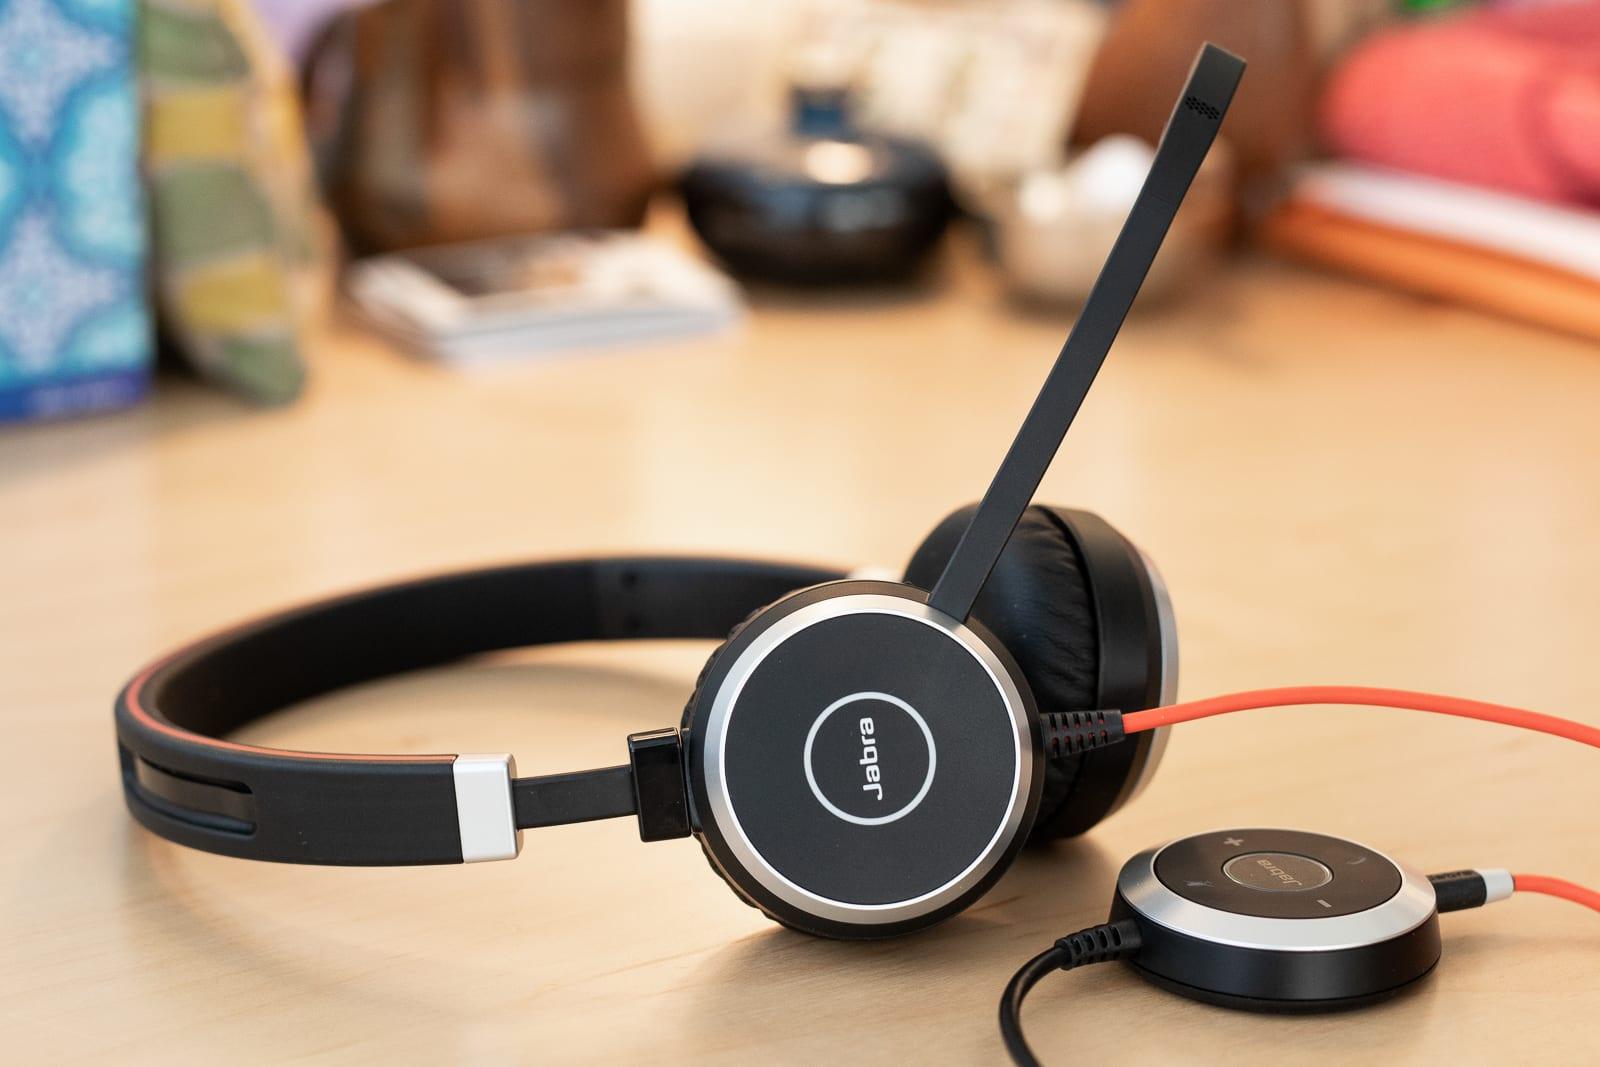 Wireless USB headsets